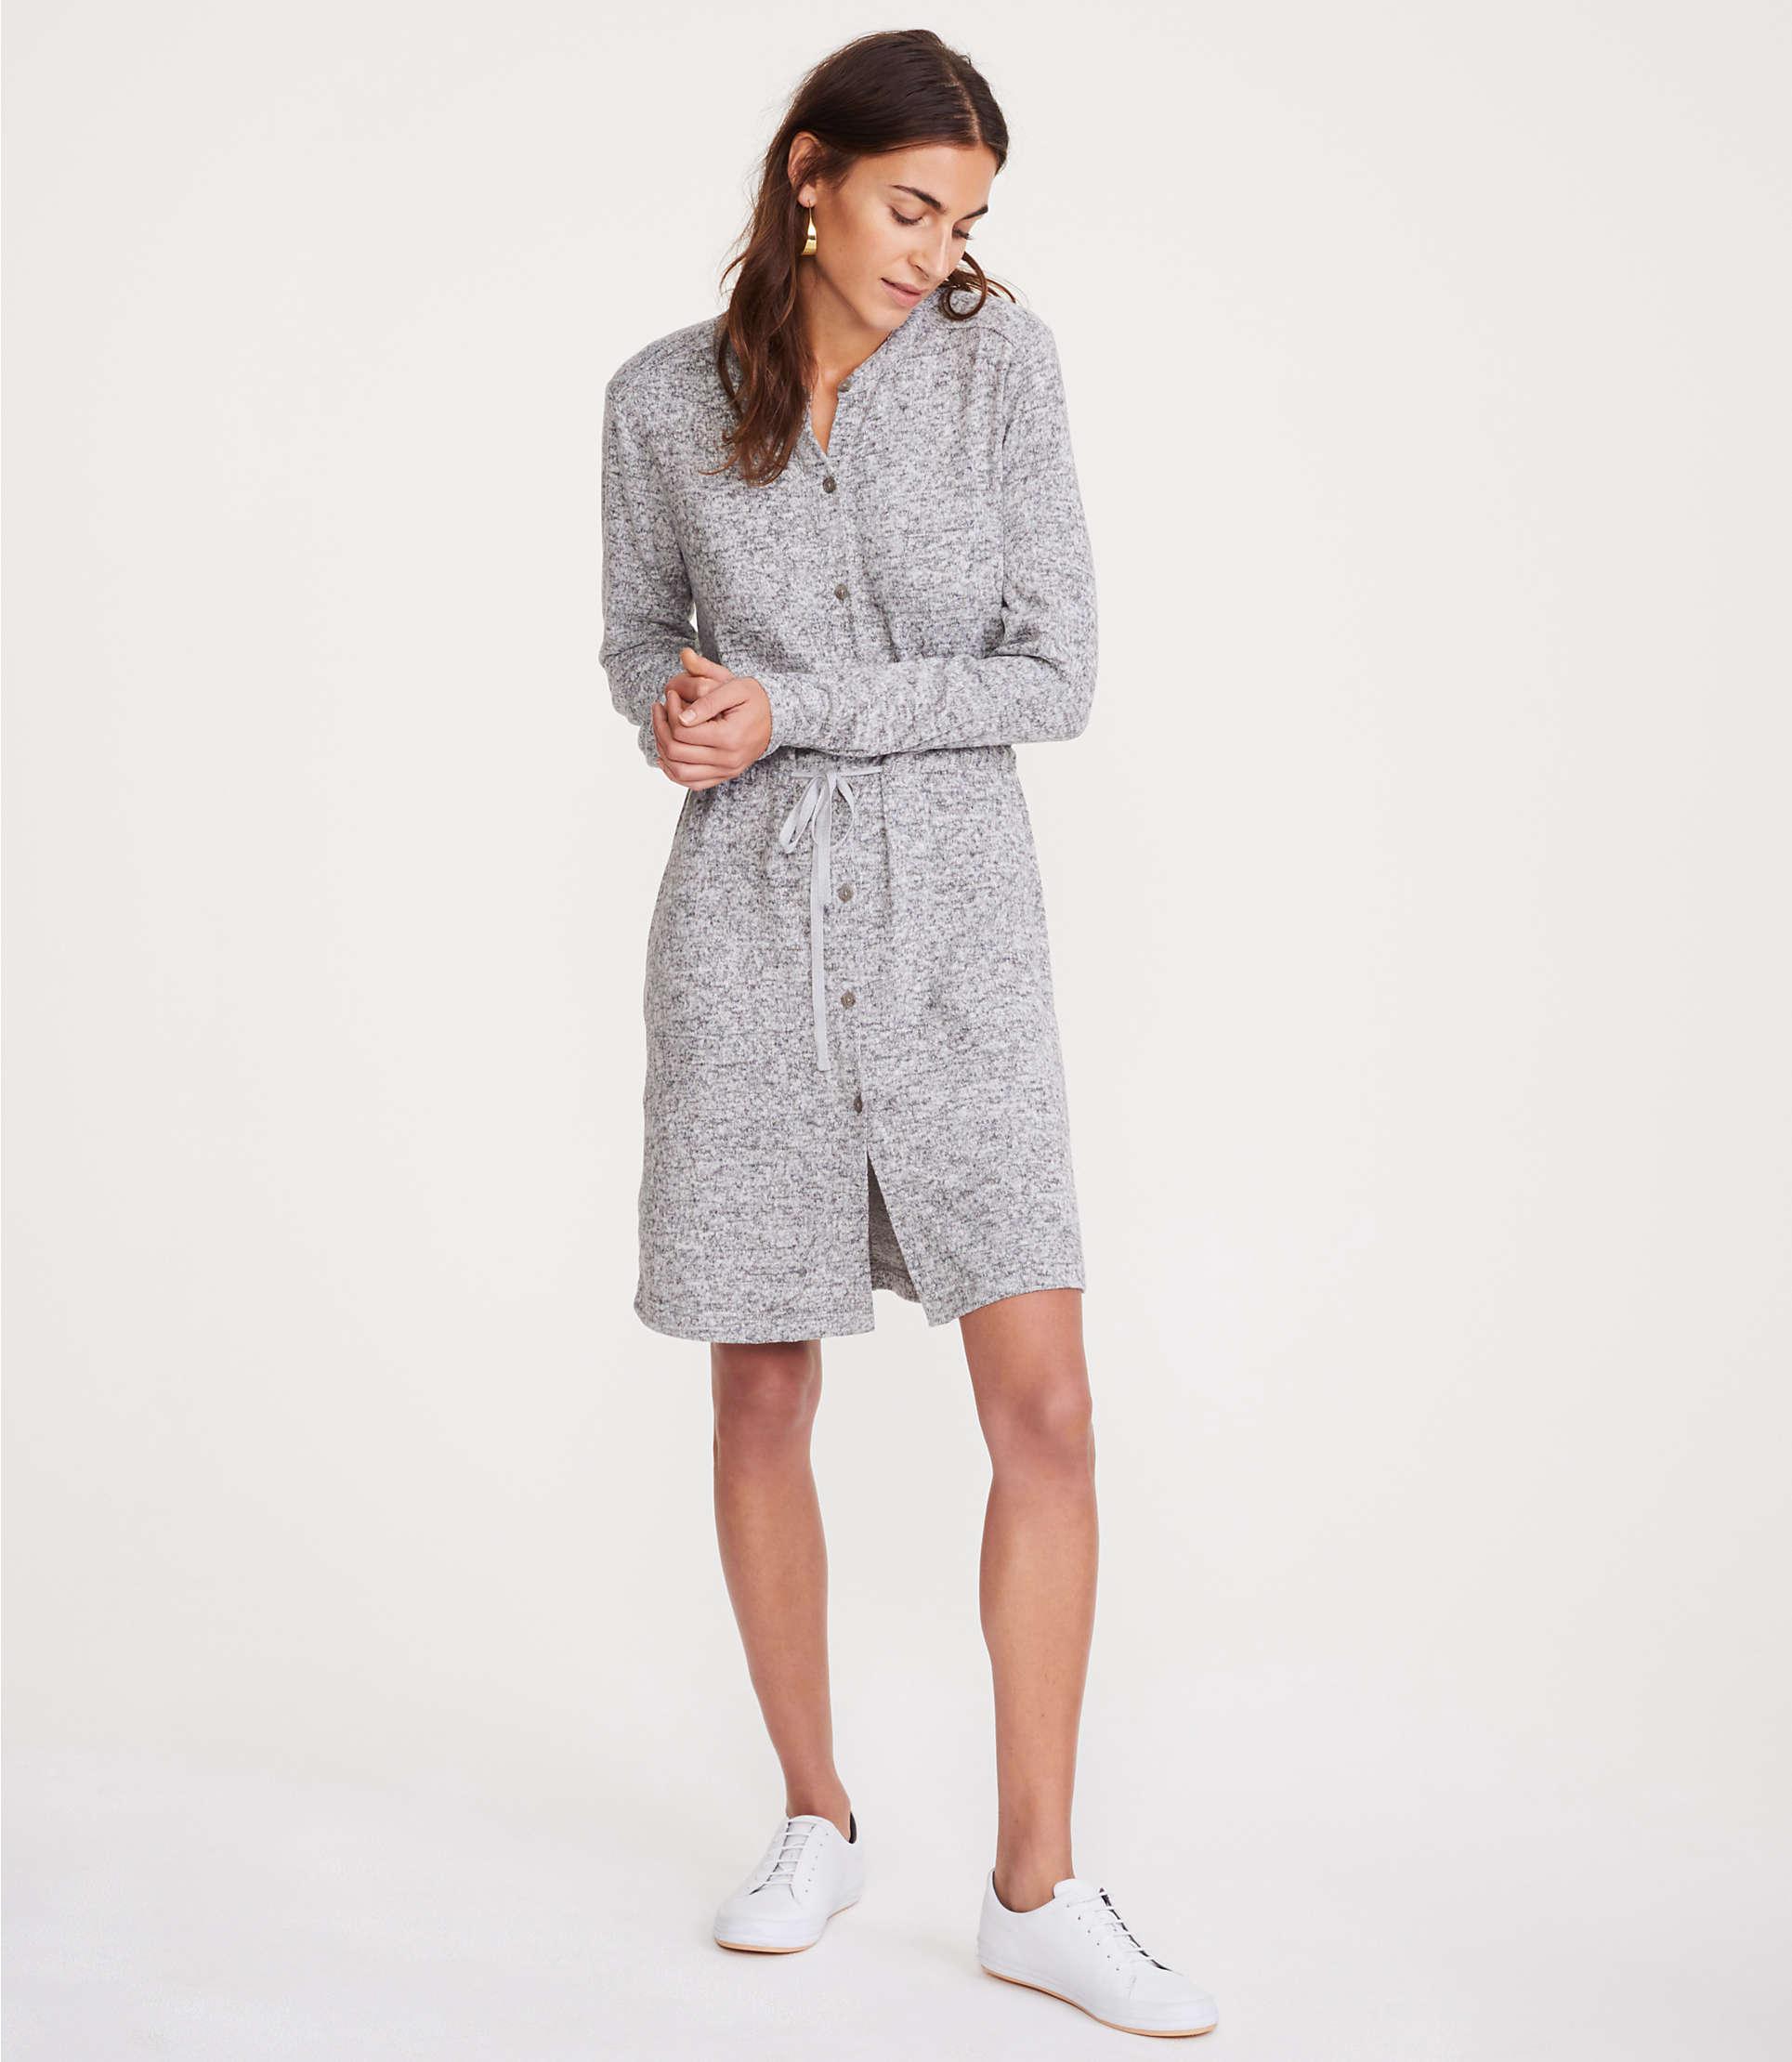 6e297509407 LOFT - Gray Lou   Grey Brushmarl Shirtdress - Lyst. View fullscreen